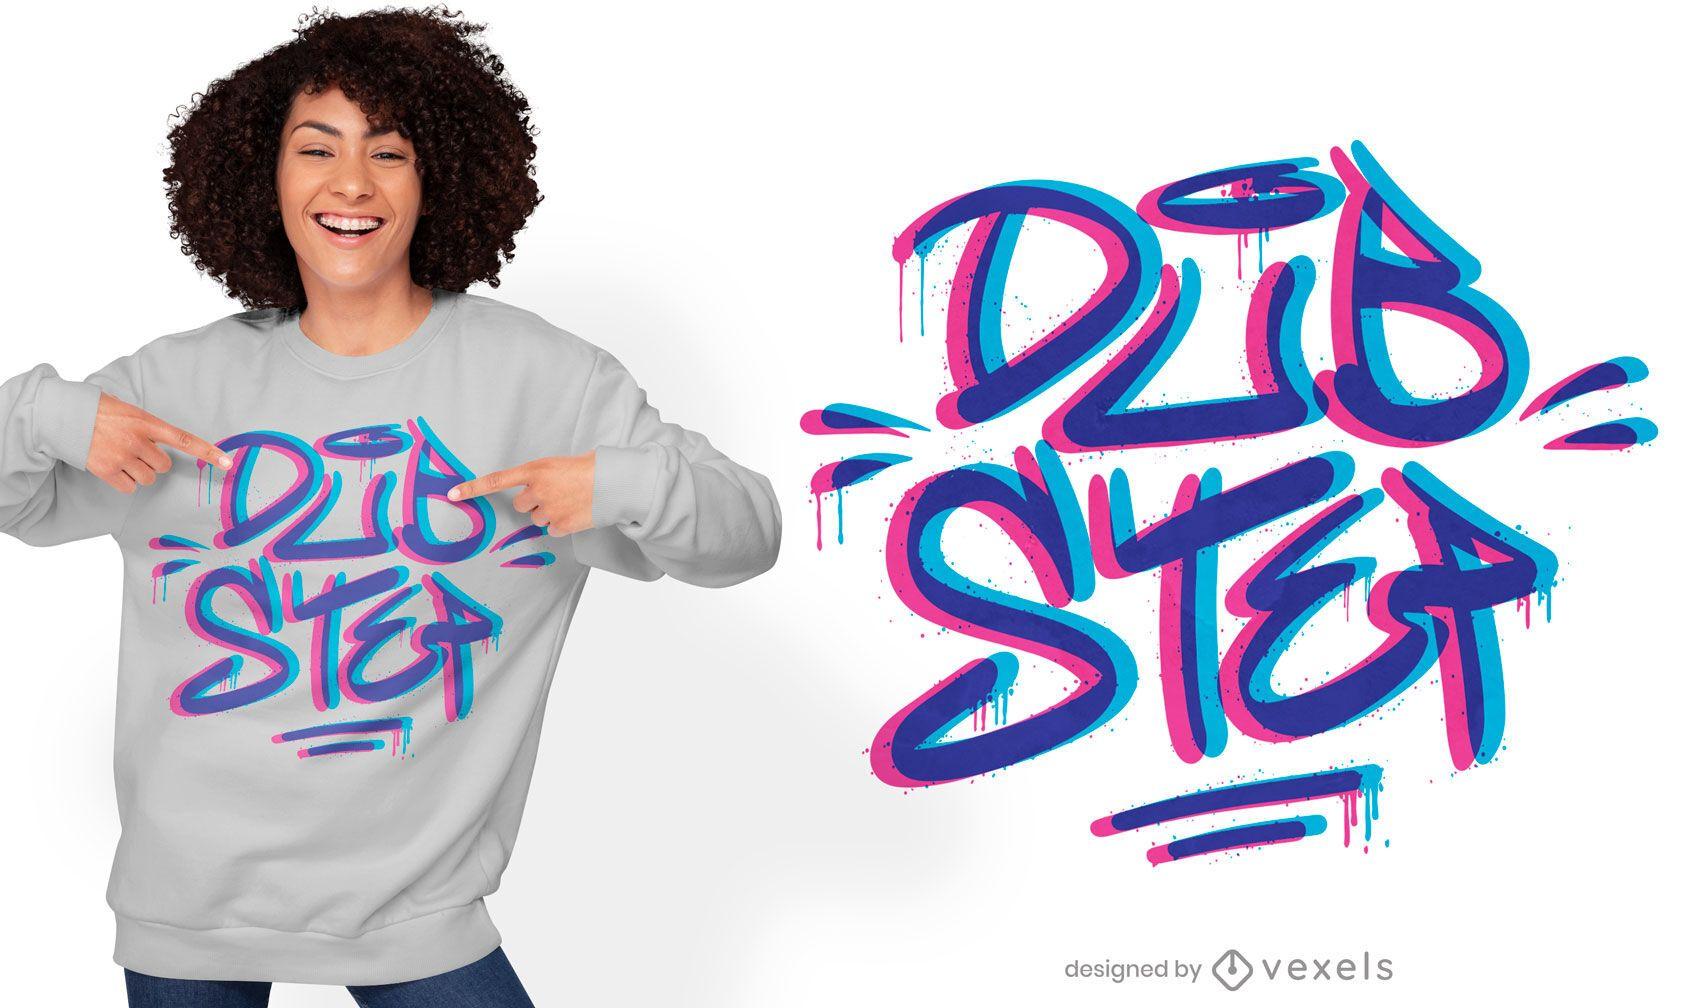 Diseño de camiseta dubstep estilo graffiti.